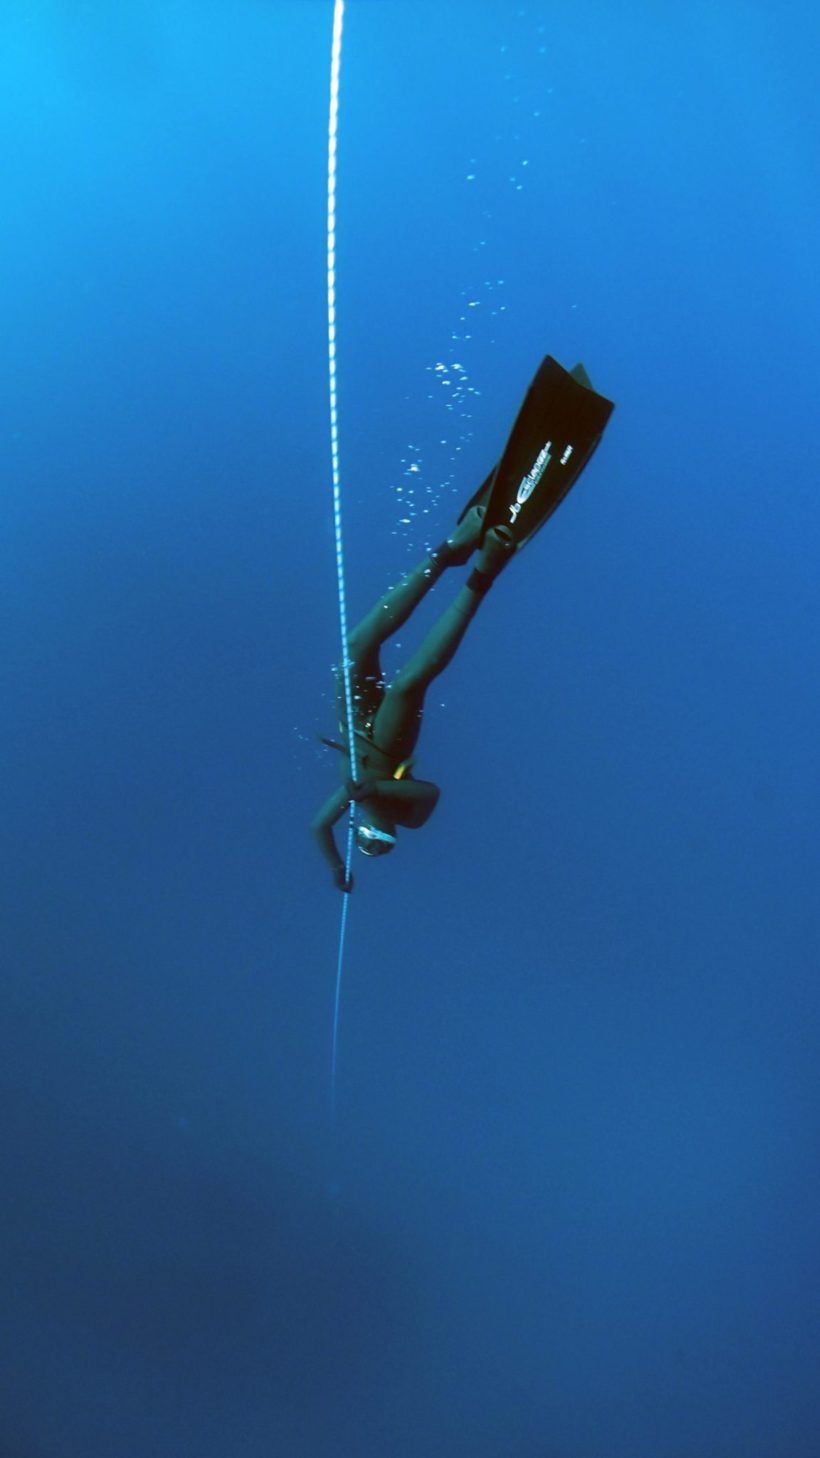 Apnoetauchen am Seil